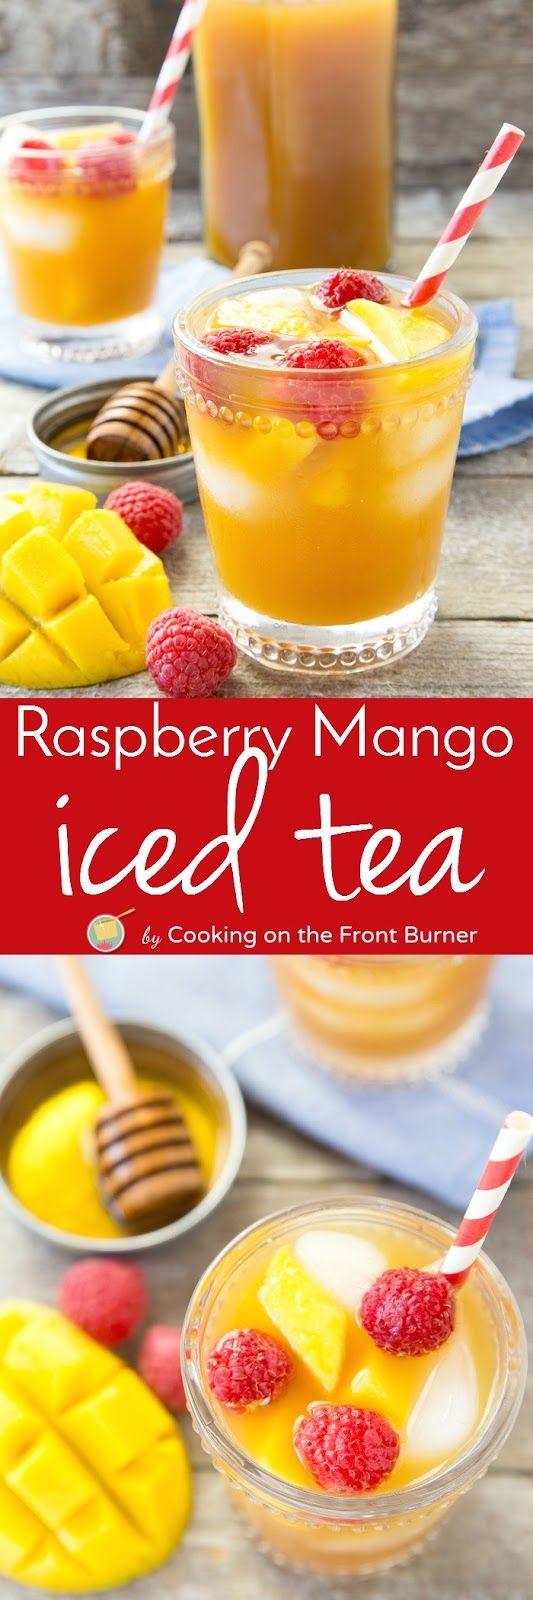 You will love this easy refreshing Raspberry Mango Iced Tea recipe.  Enjoy all summer long!